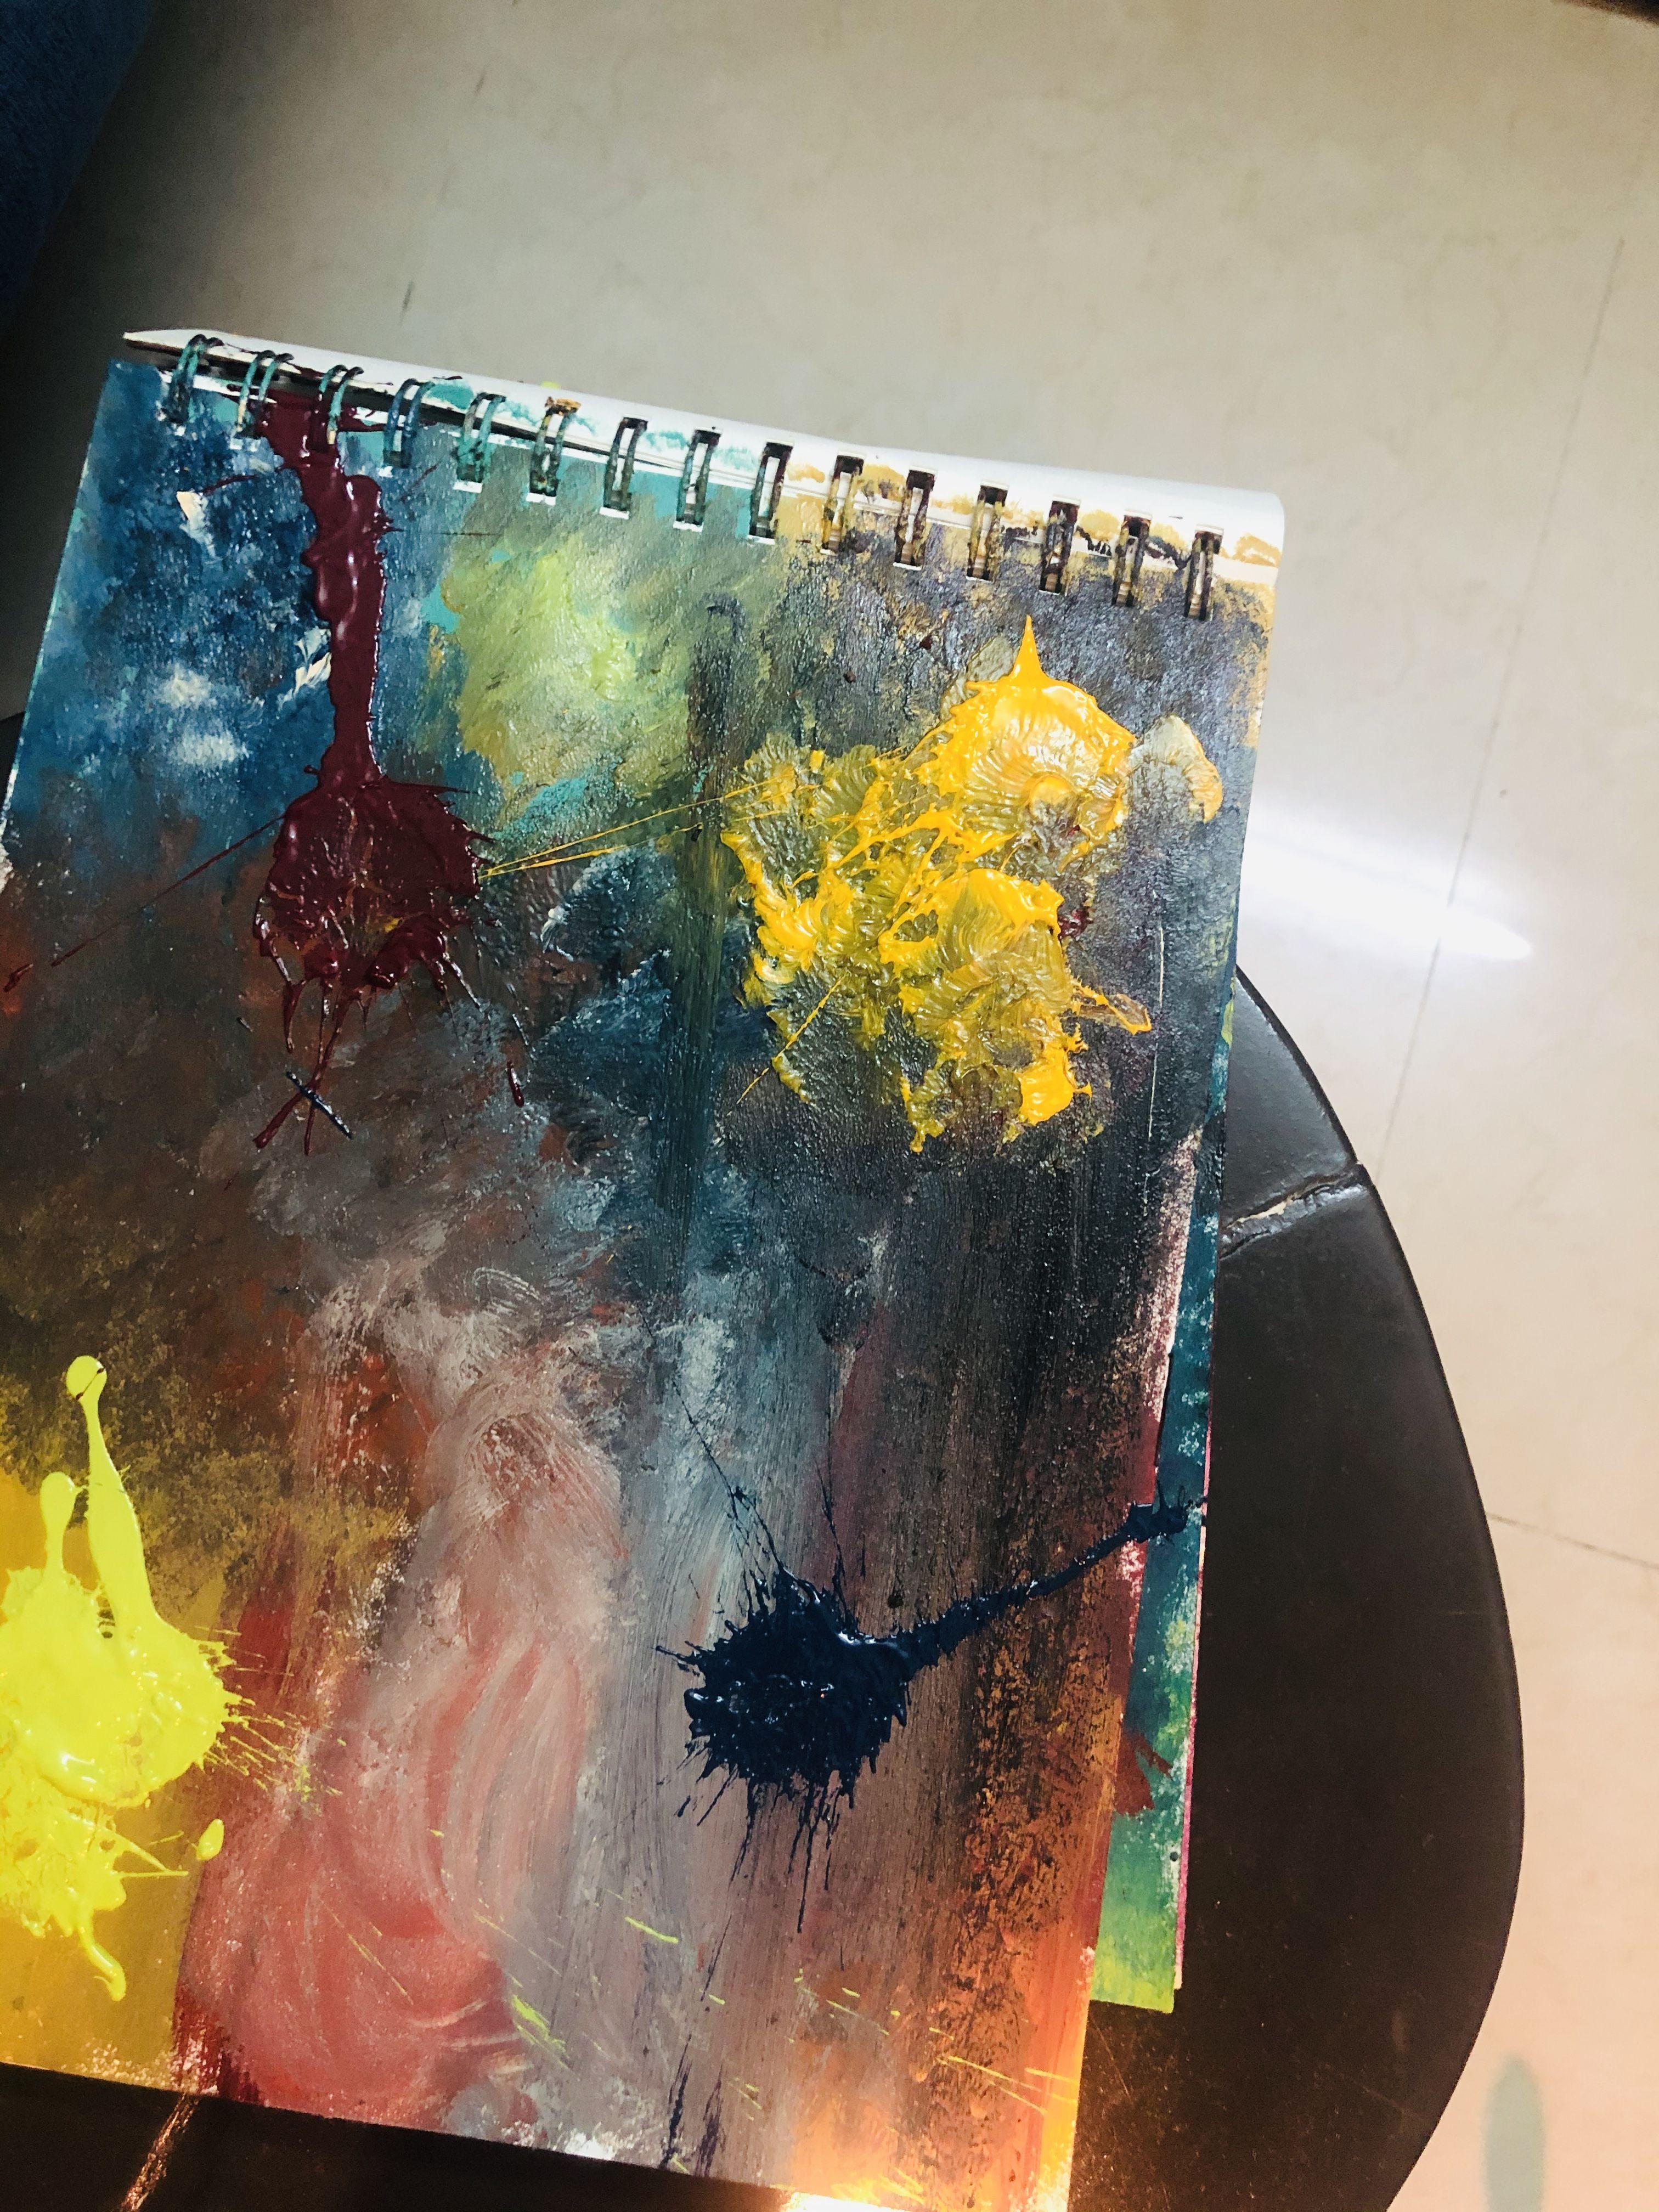 Abstract painting abstract painting painting painting